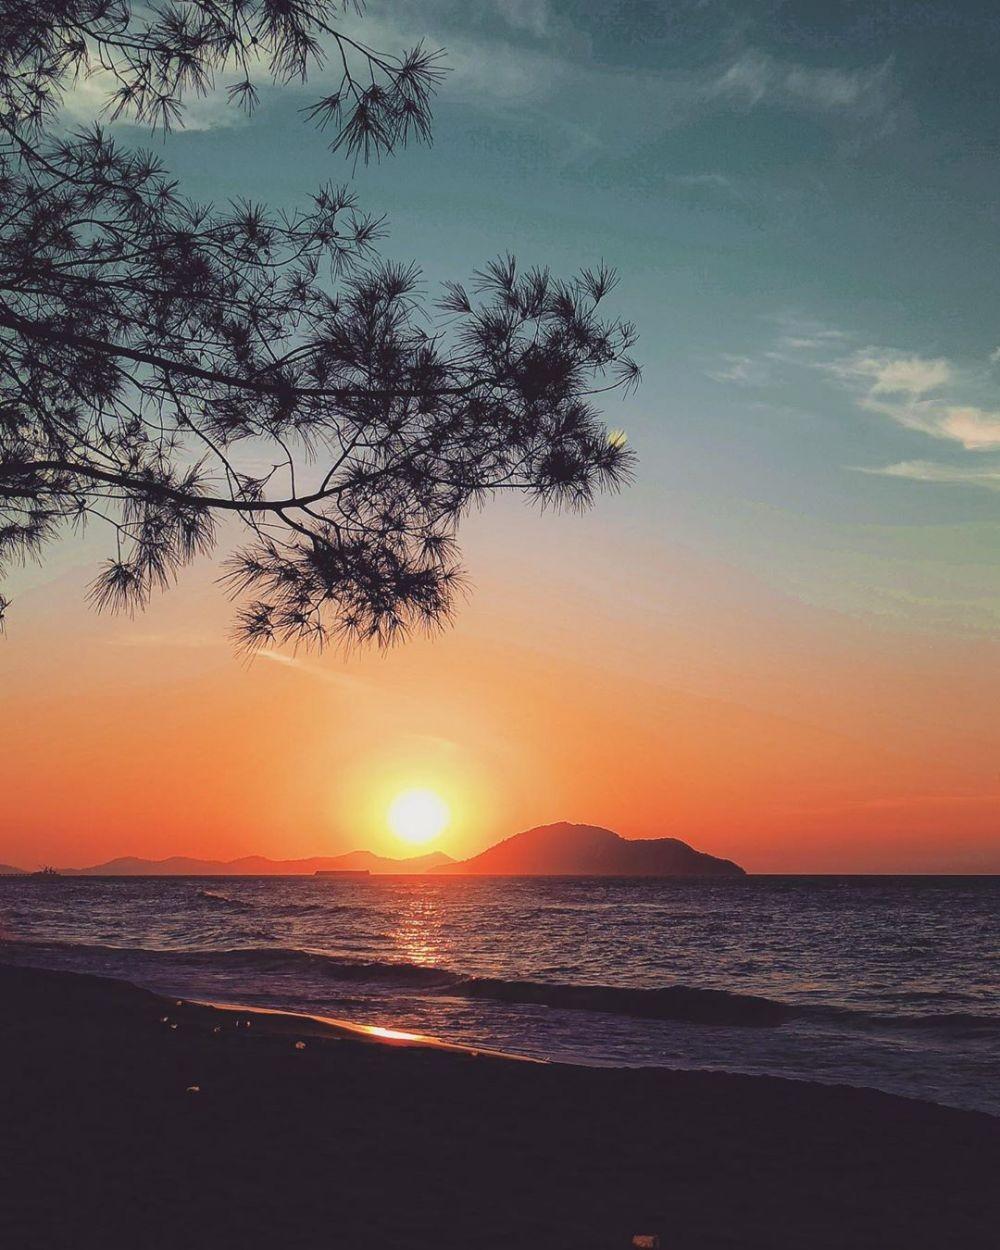 10 Destinasi Wisata Paling Populer di Kalimantan, Menawan Banget!